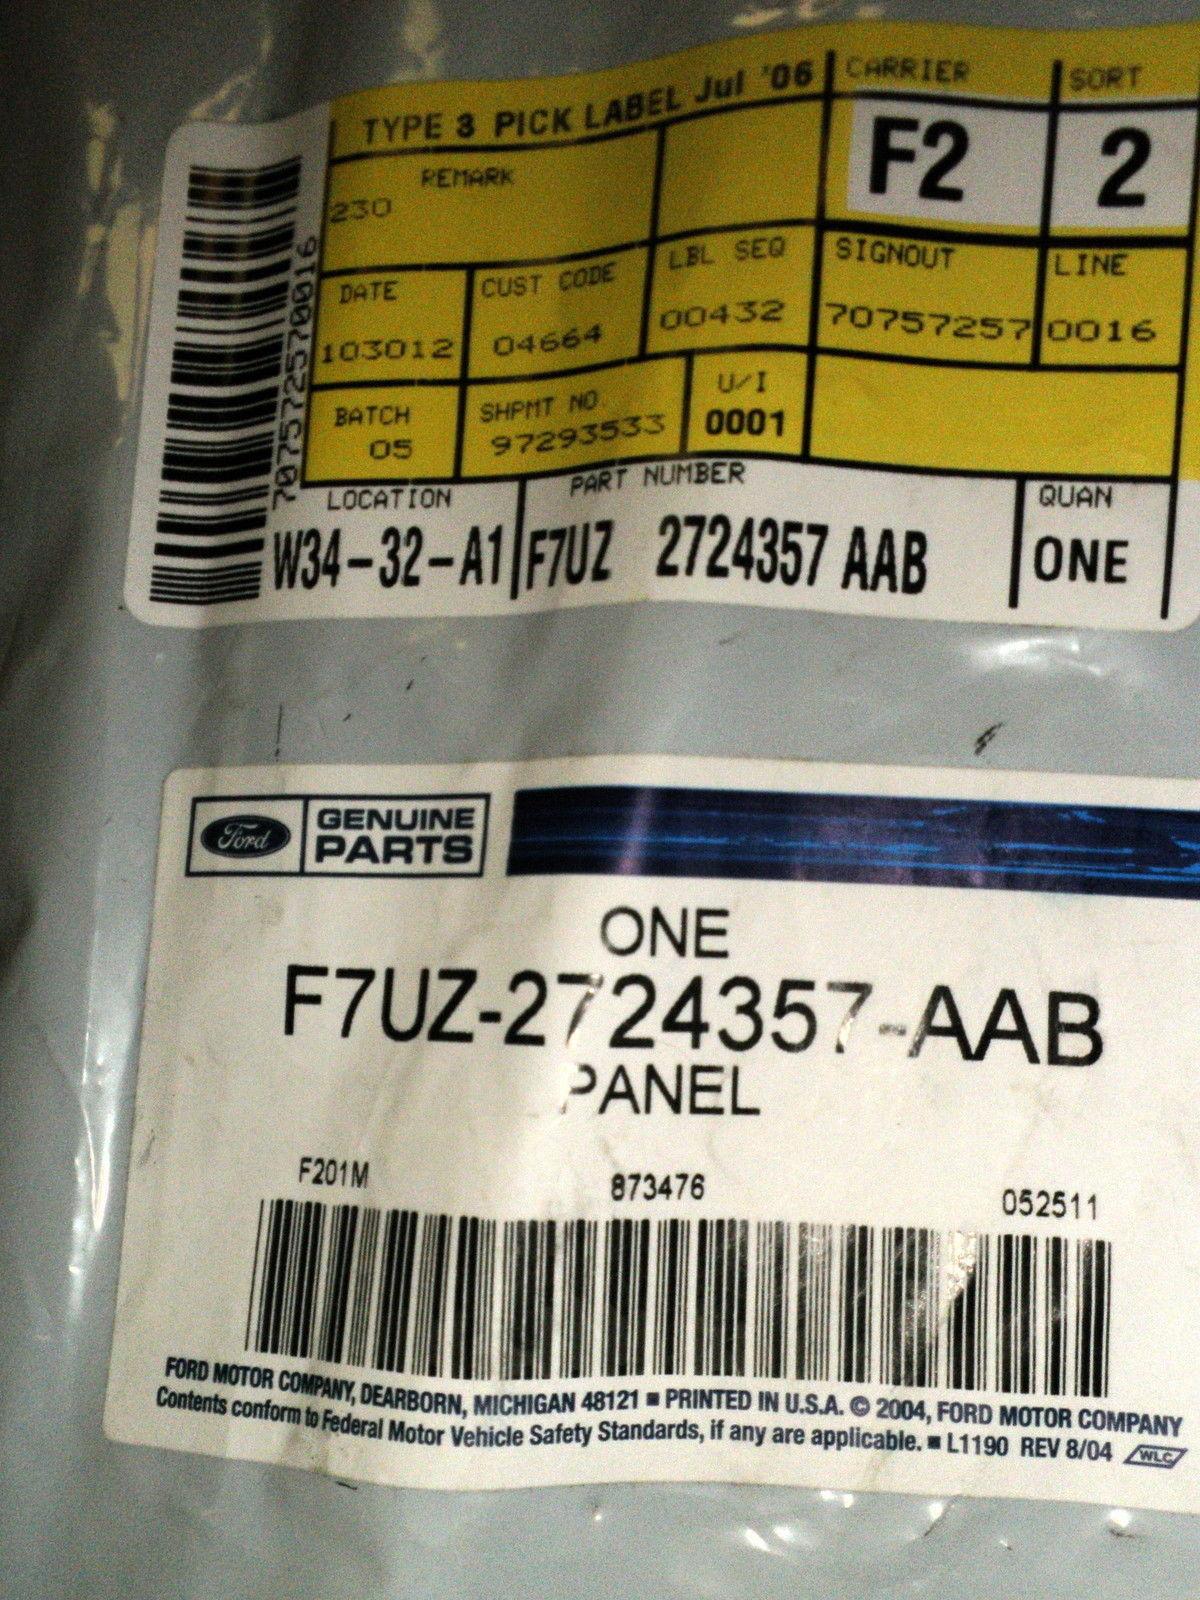 Ford Genuine Parts - Trim Panel  #F7UZ-2724357-AAB